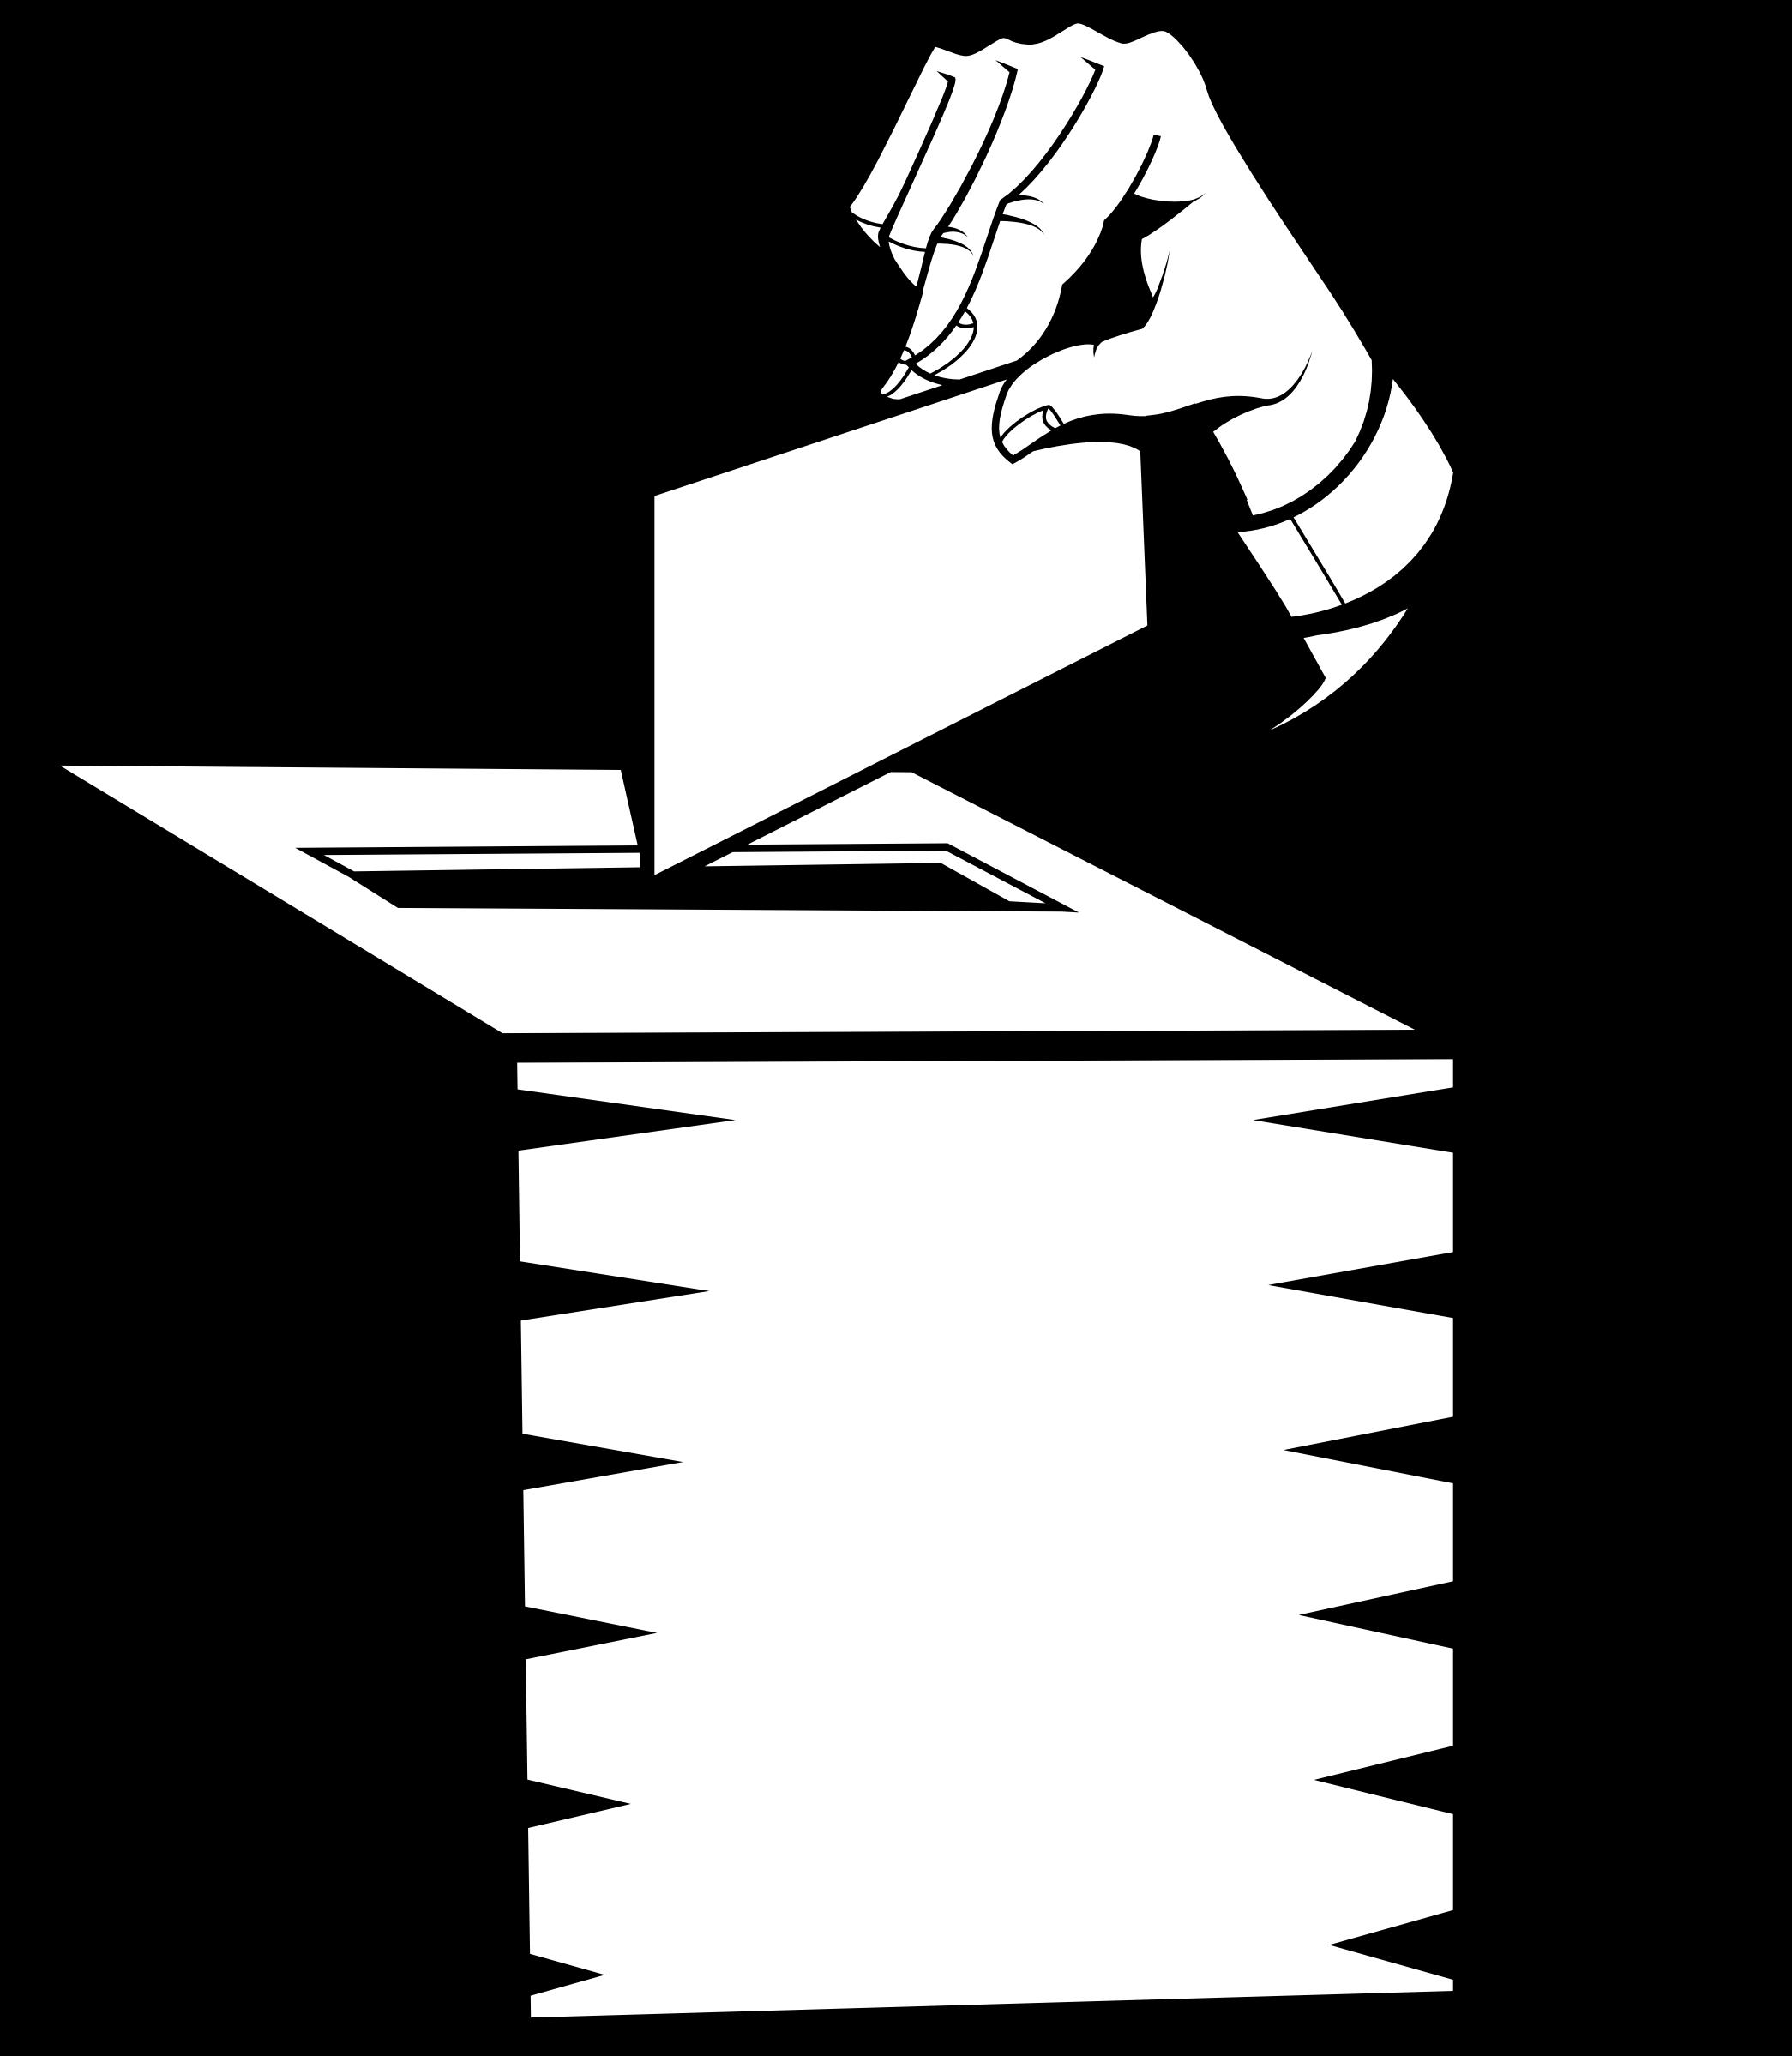 Voting clipart politics, Voting politics Transparent FREE.